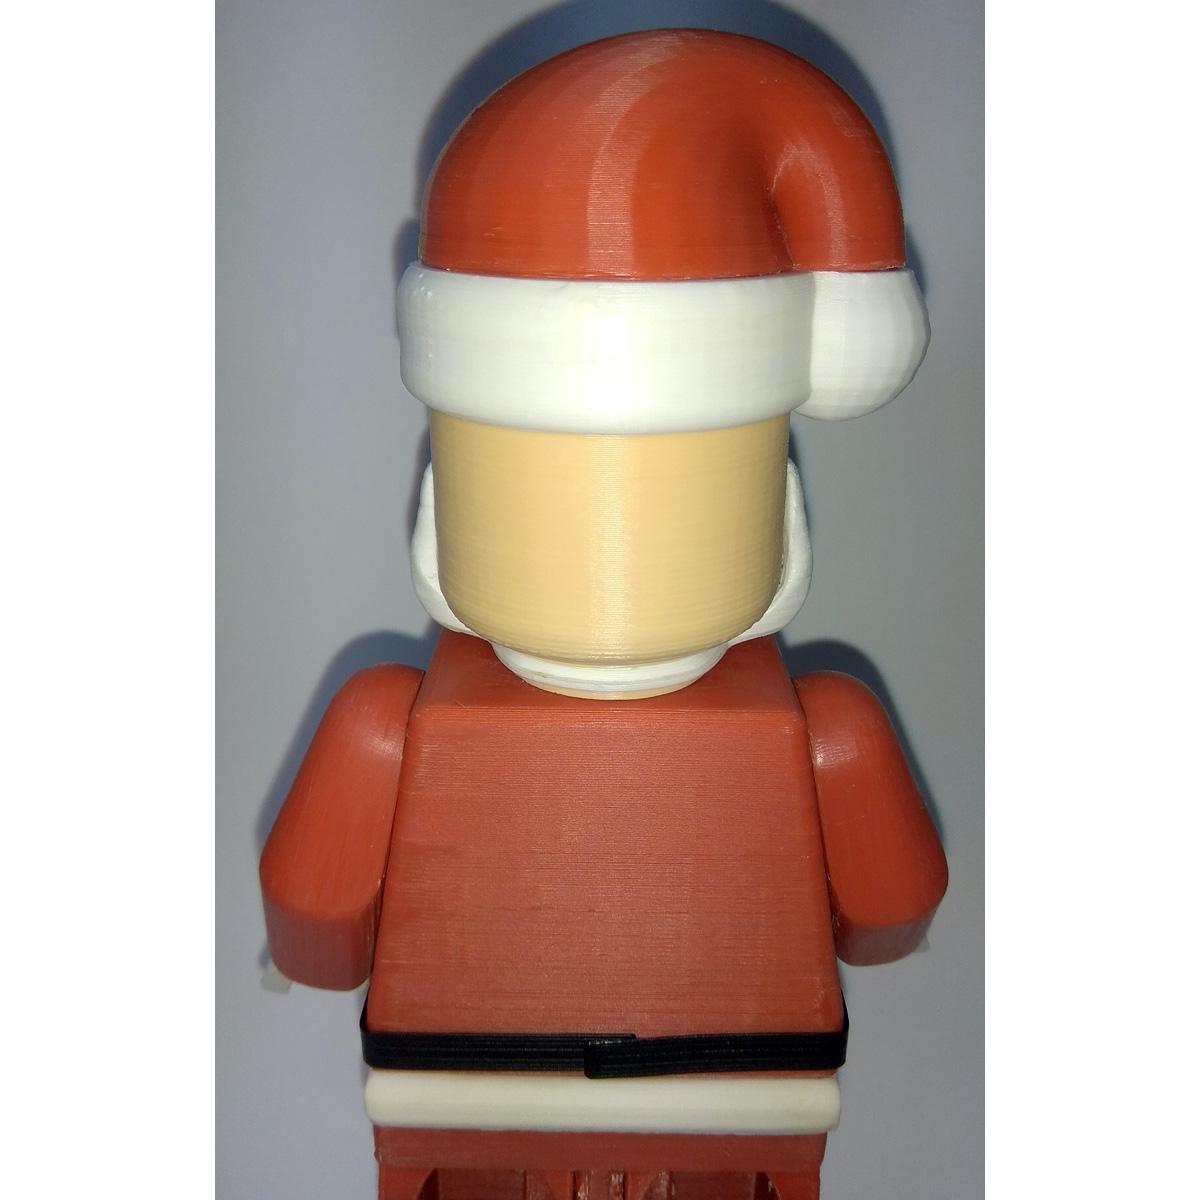 Lego_Minifig_-_Santa_Clause_7.jpg Download free STL file Jumbo Christmas - Santa Claus • 3D printer template, HowardB